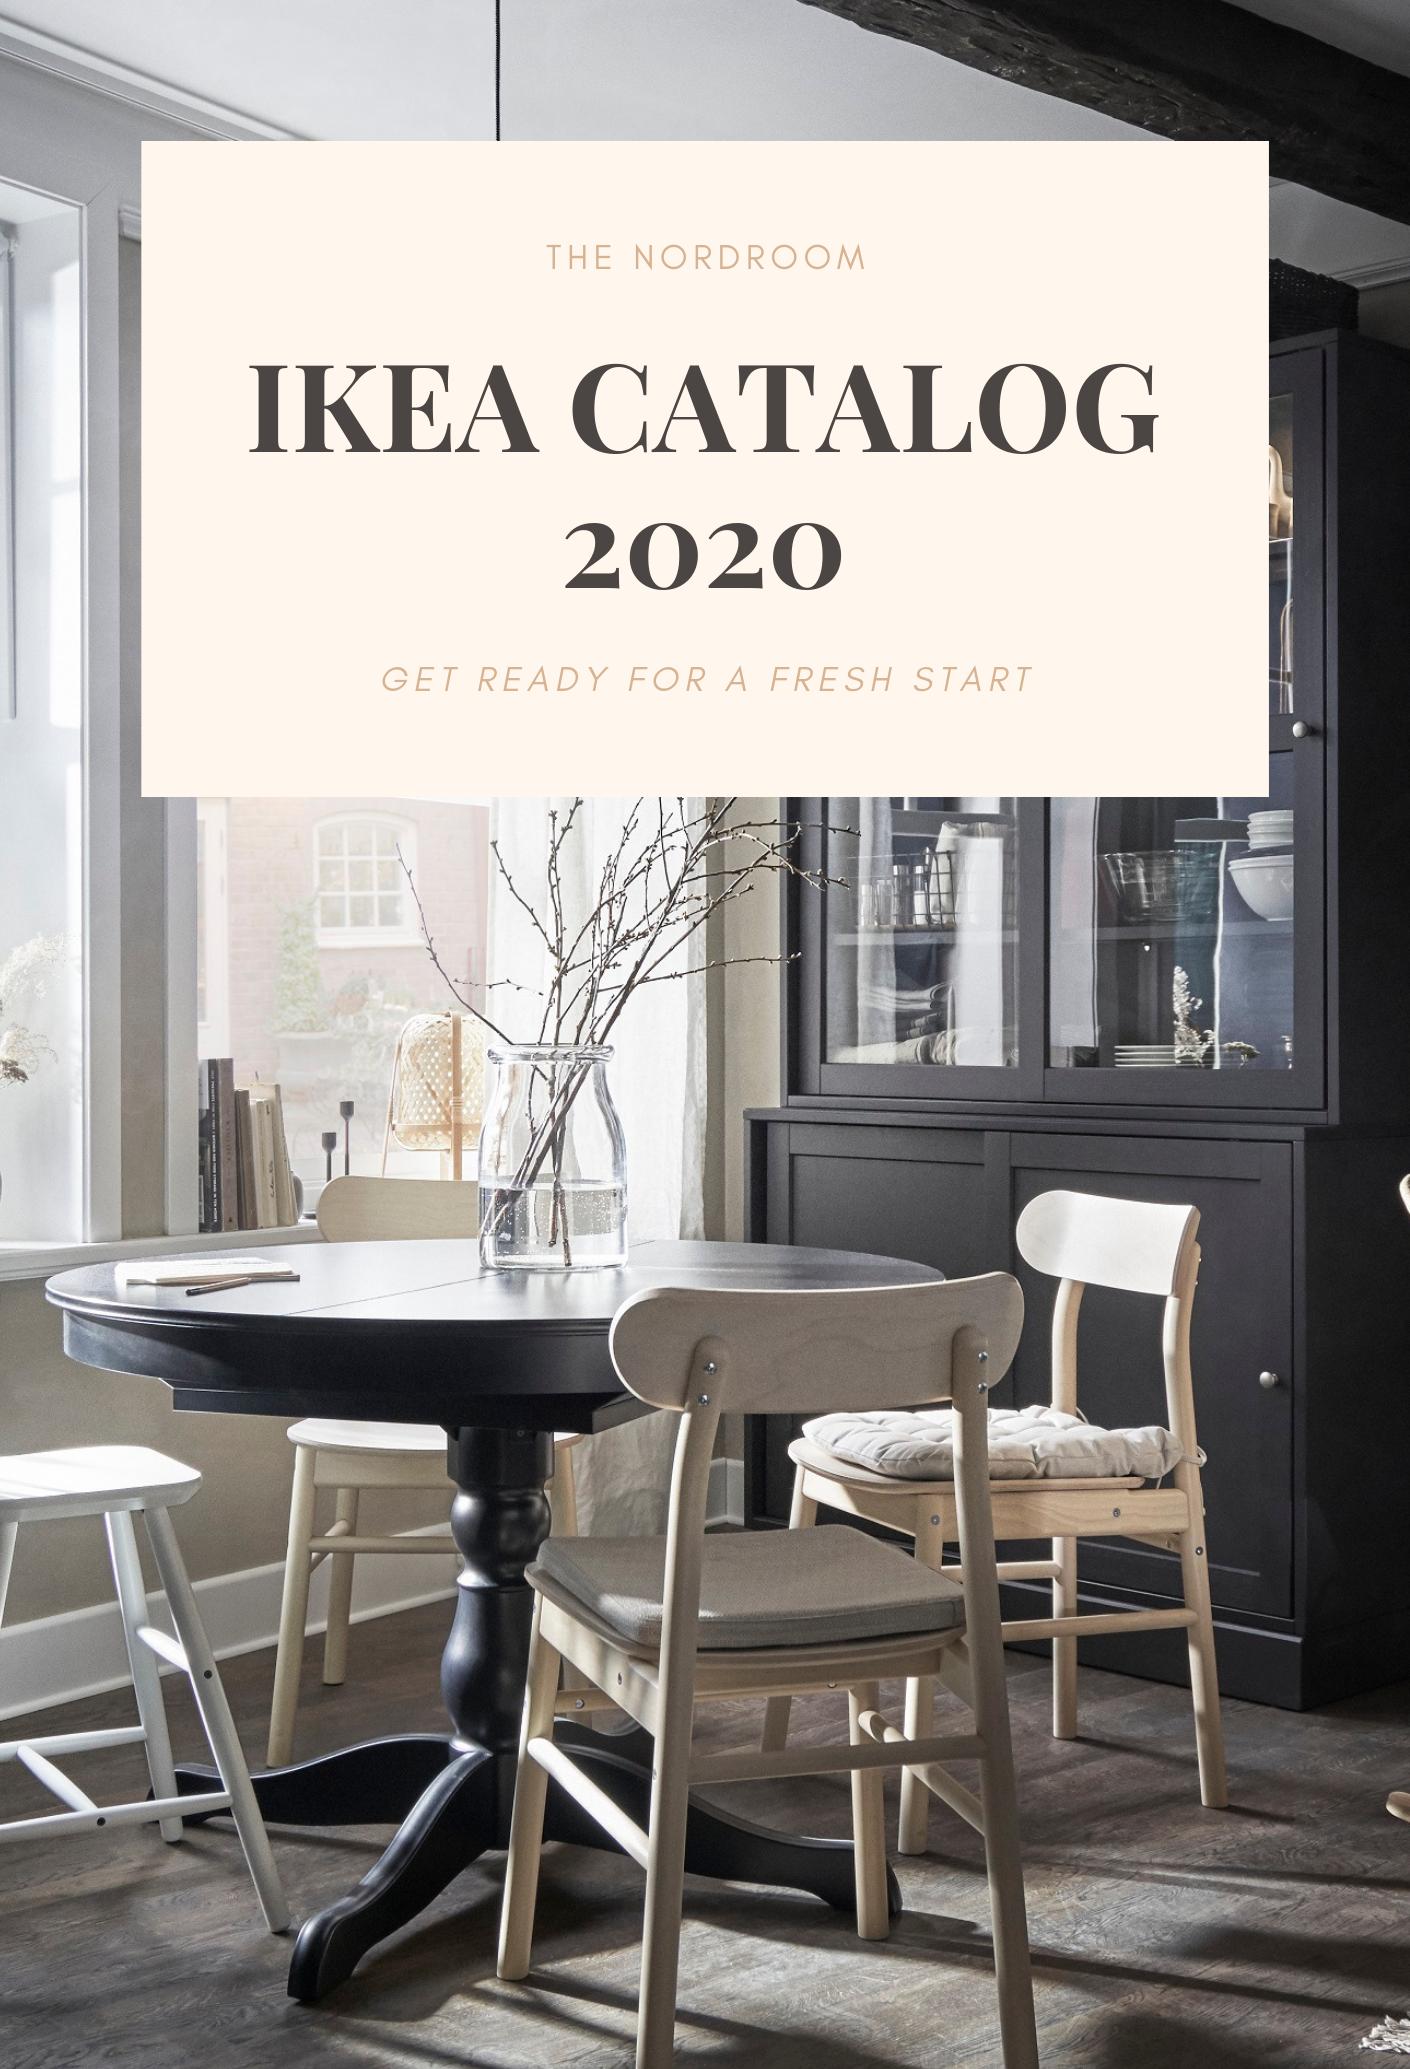 IKEA Catalog 2020 Get Ready For A Fresh Start Ikea